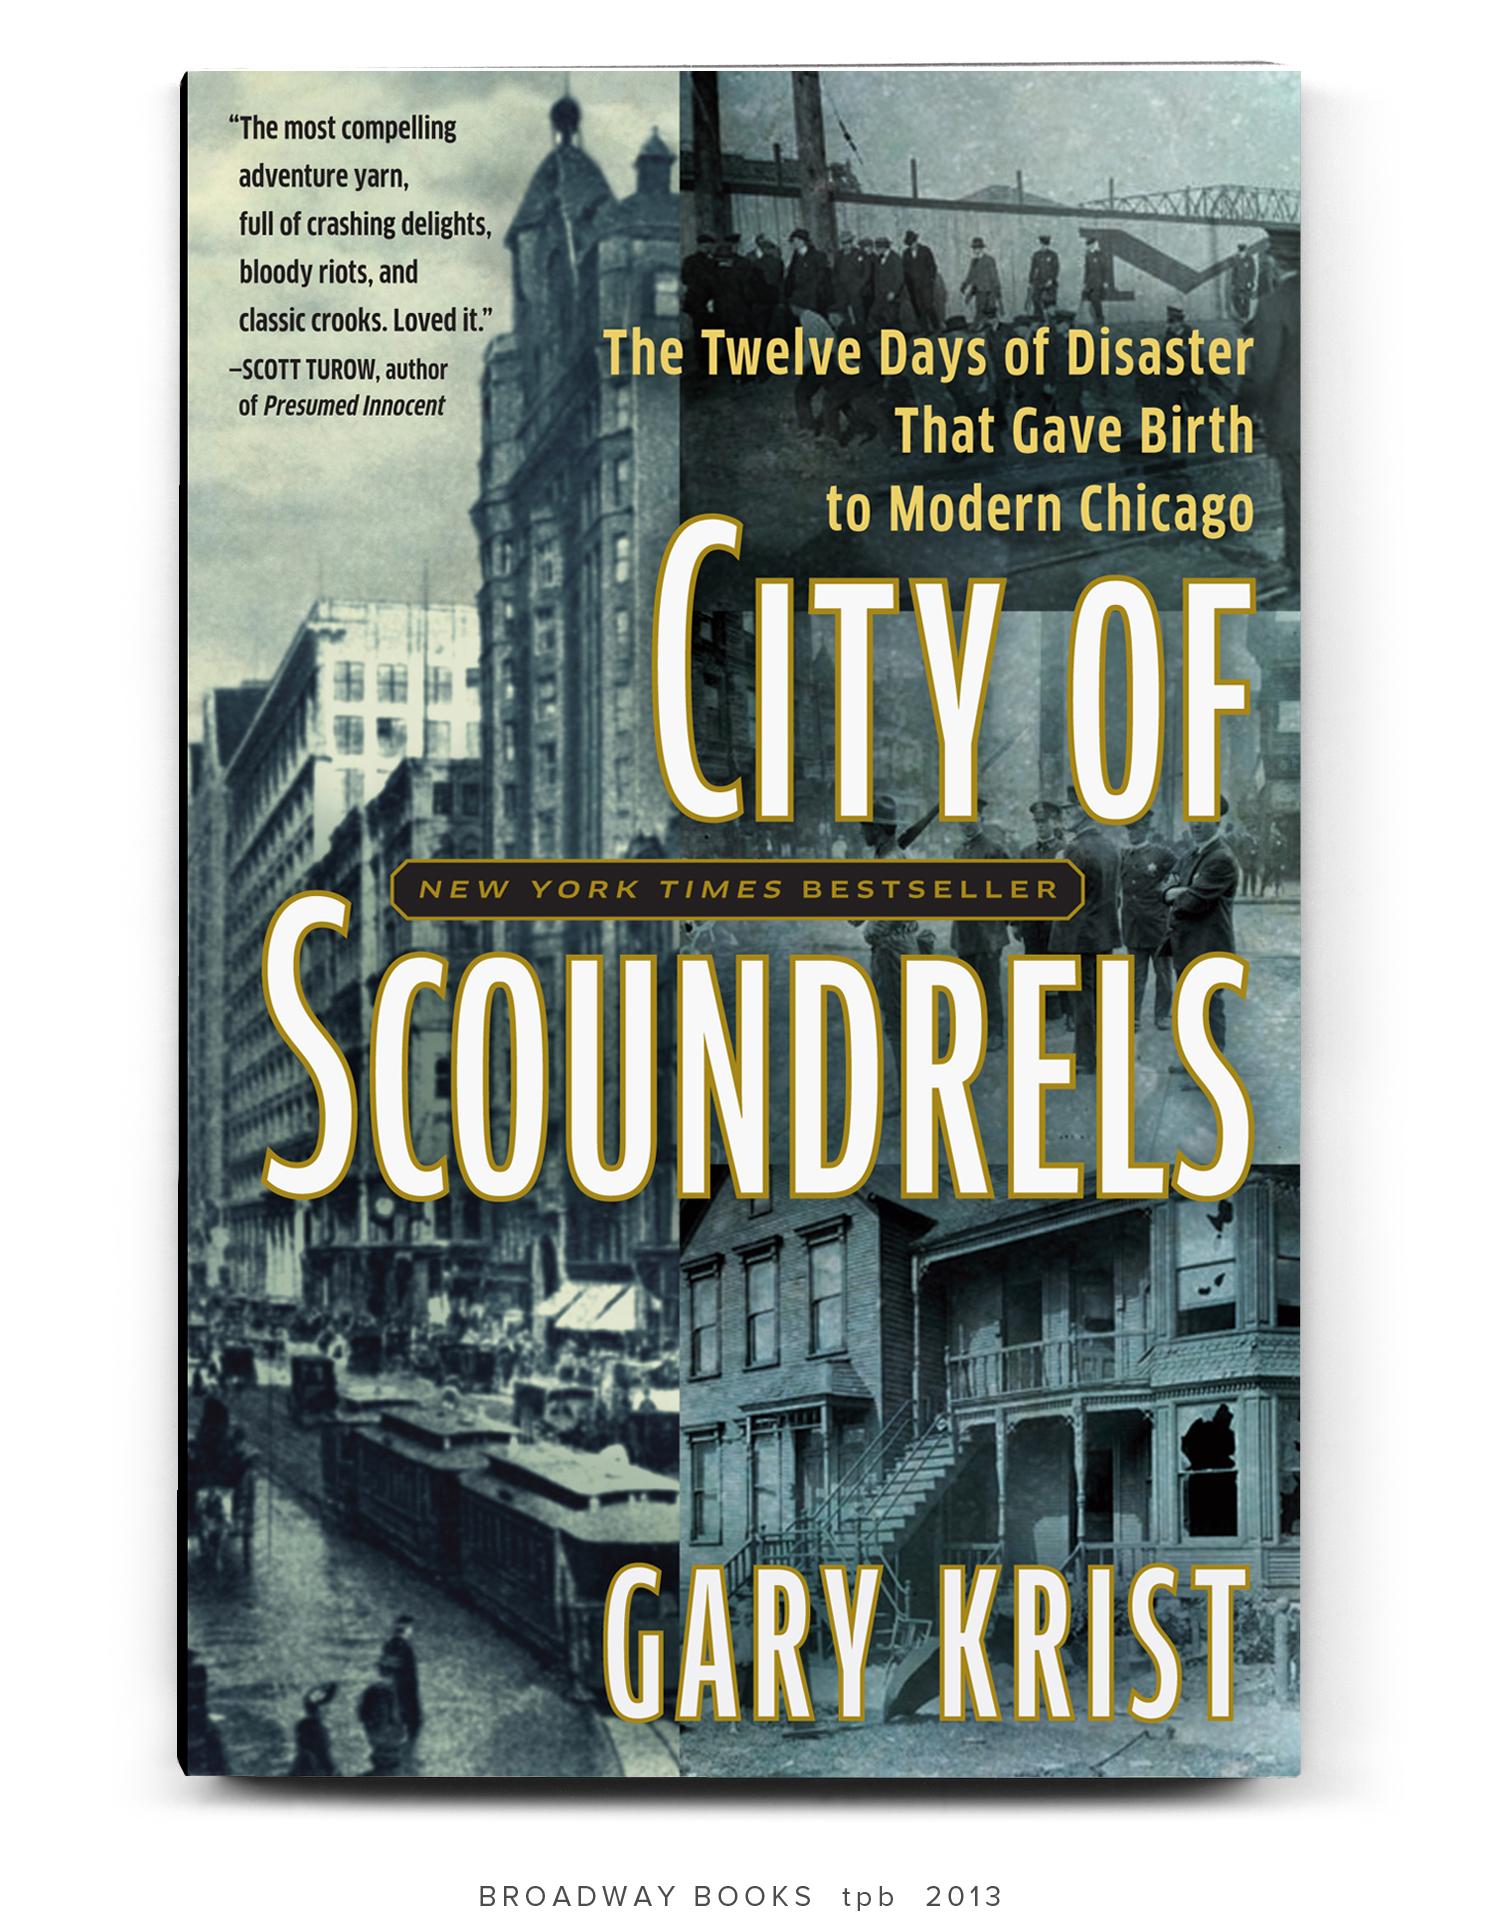 CITY-OF-SCOUNDRELS-tpb-ss6.jpg